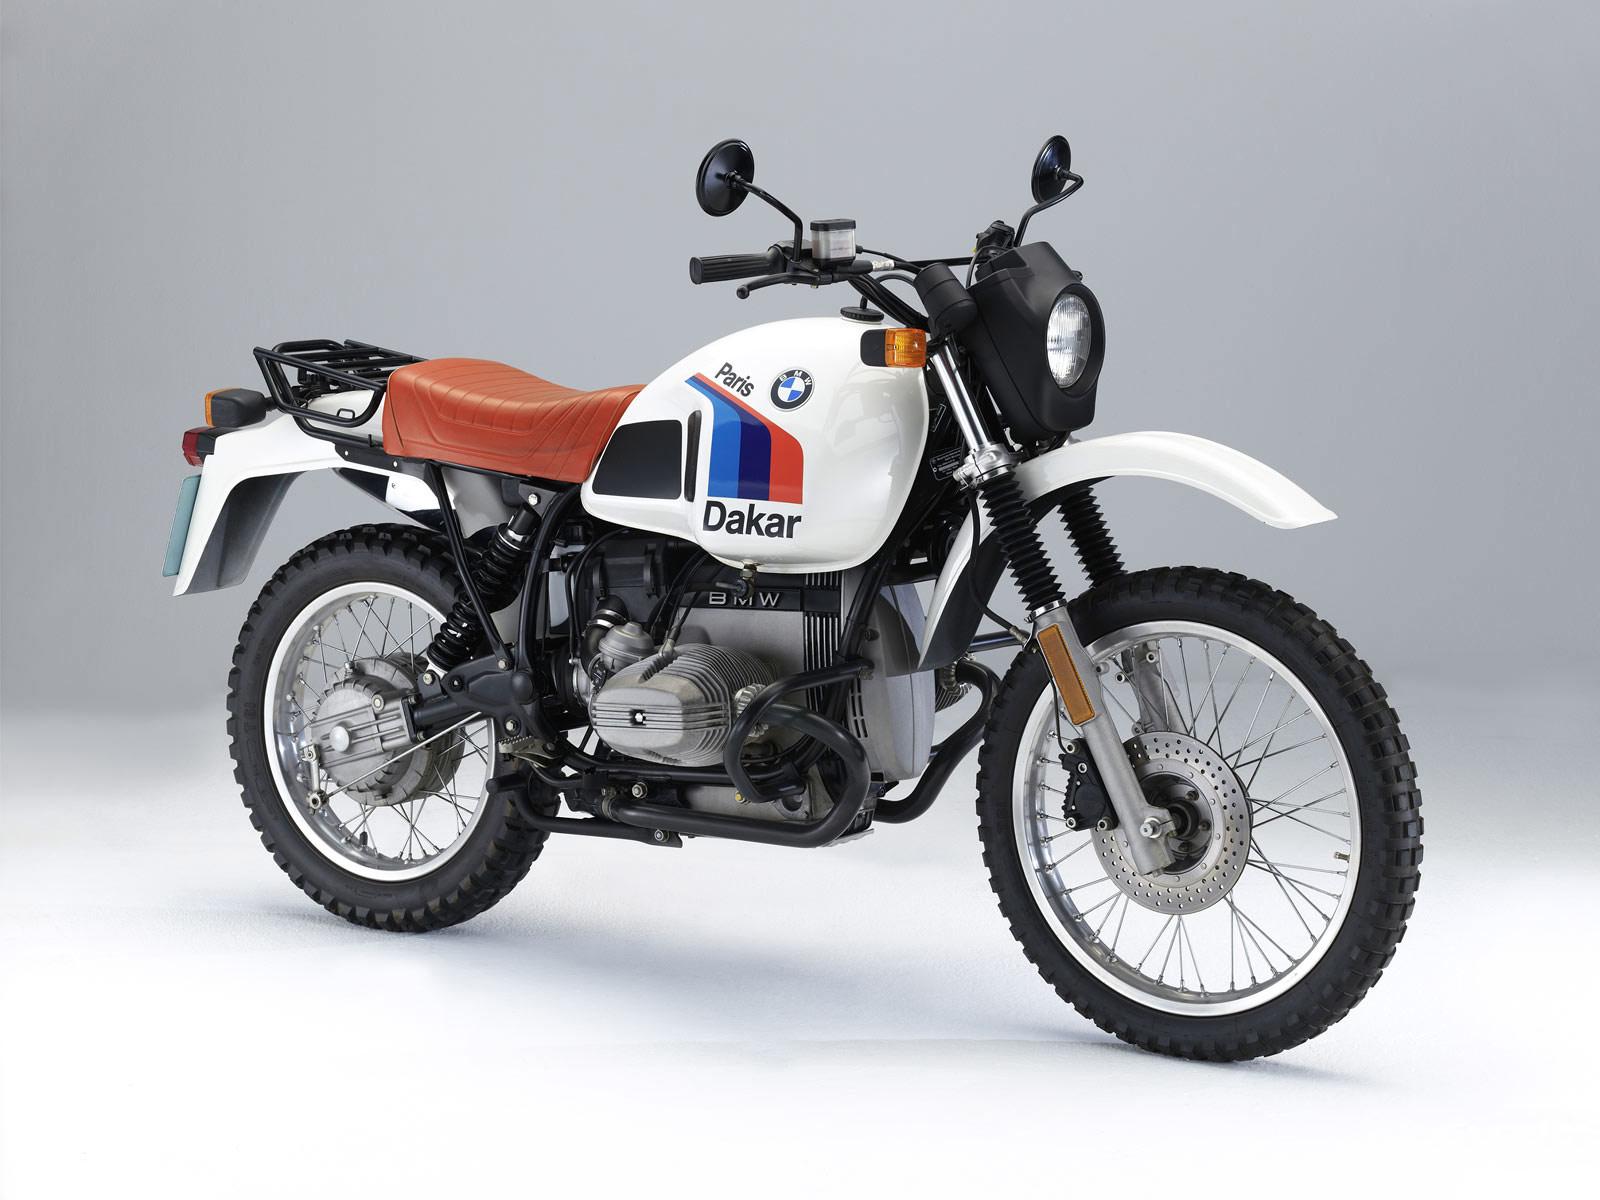 1 BMW R80 G S Paris Dakar